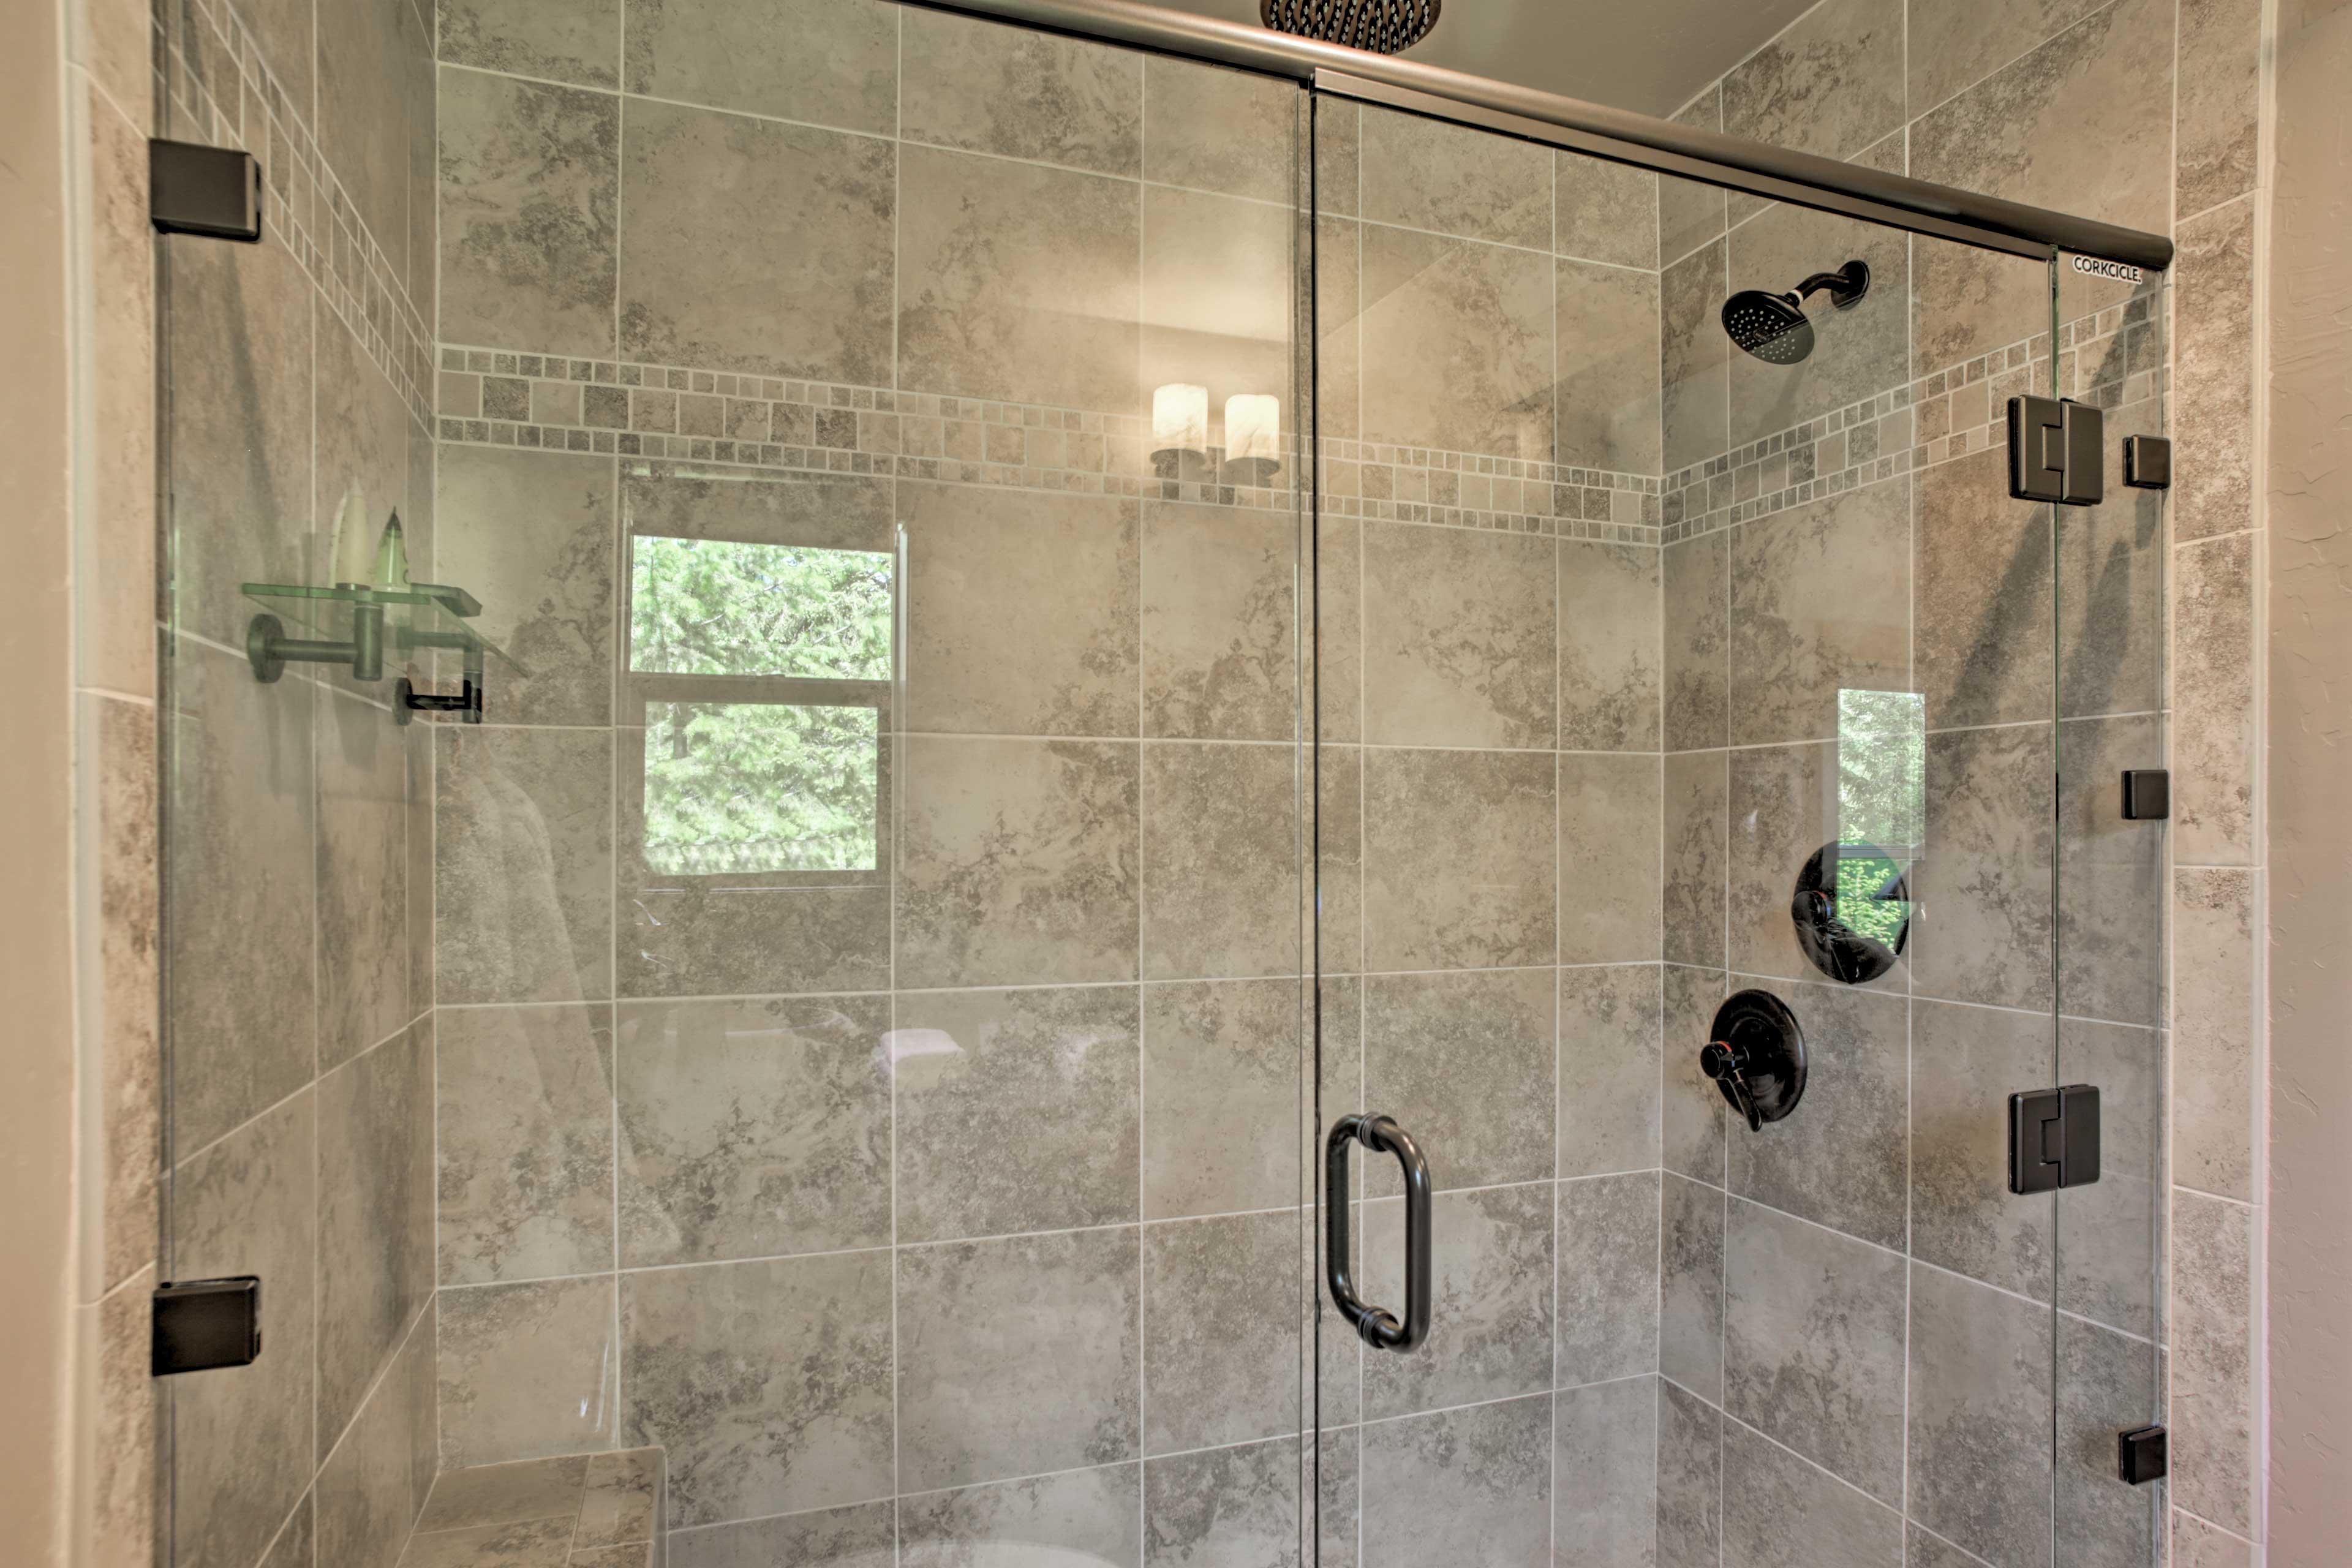 Rinse off underneath the rainfall showerhead.